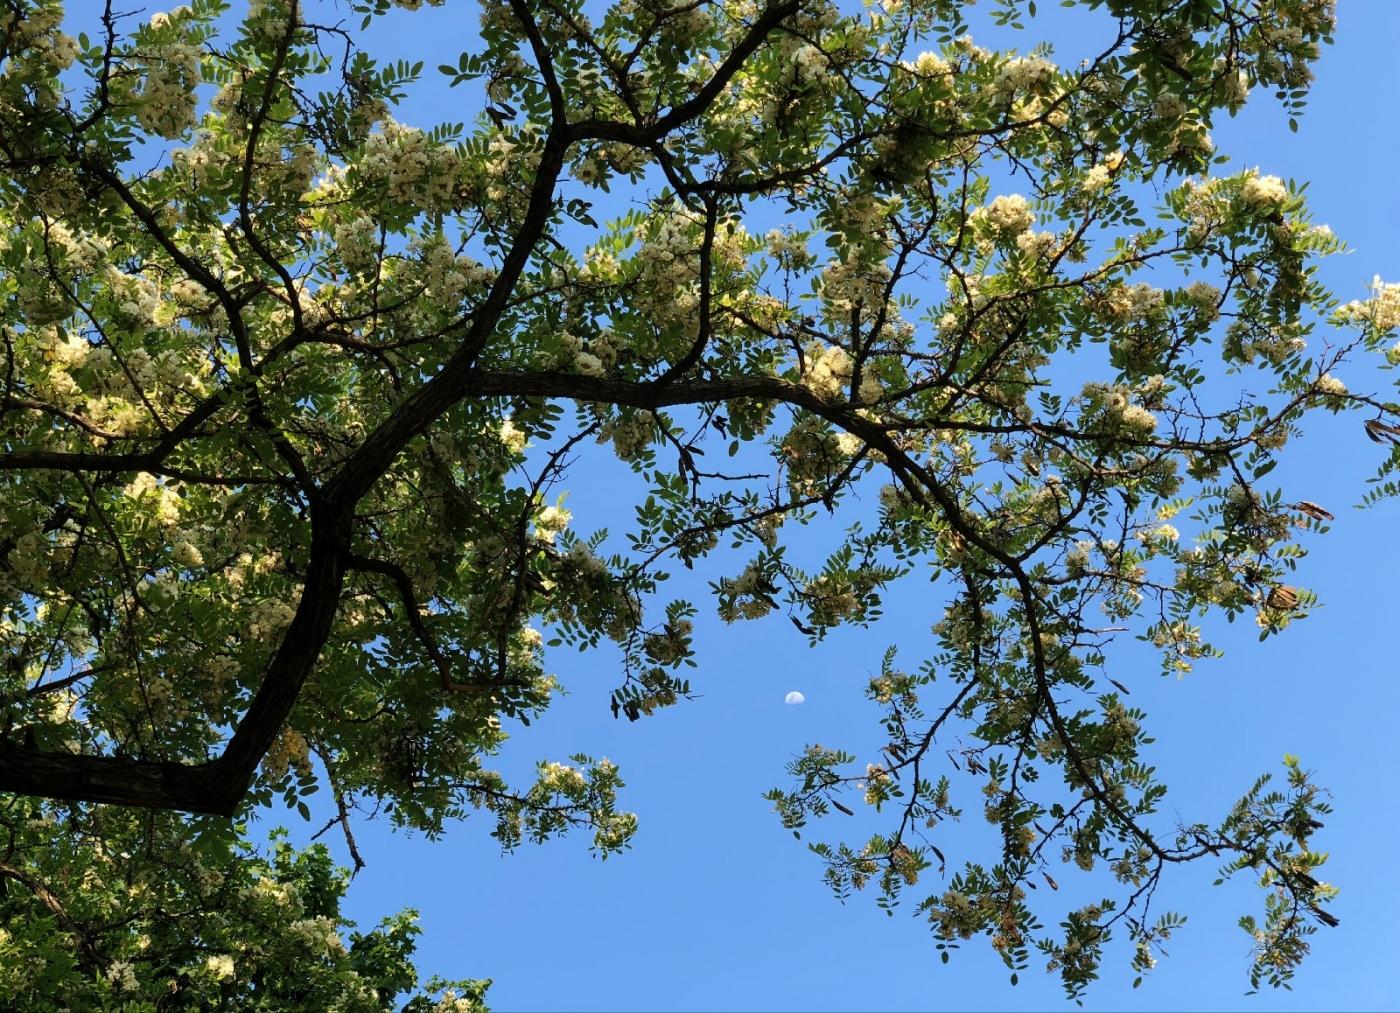 【田螺随拍】美国黄杨american yellowwood_图1-11